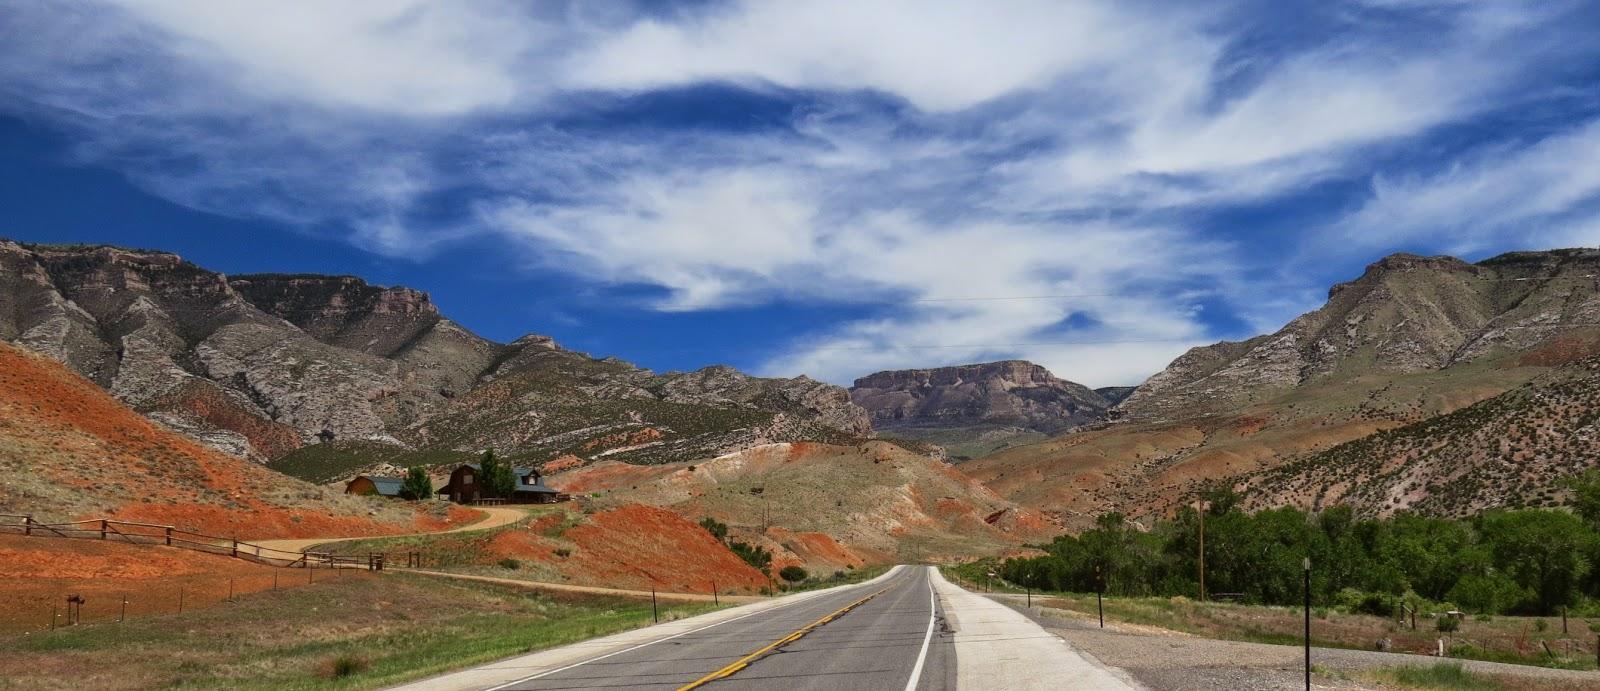 Bighorn+Scenic+Byway+2.jpg